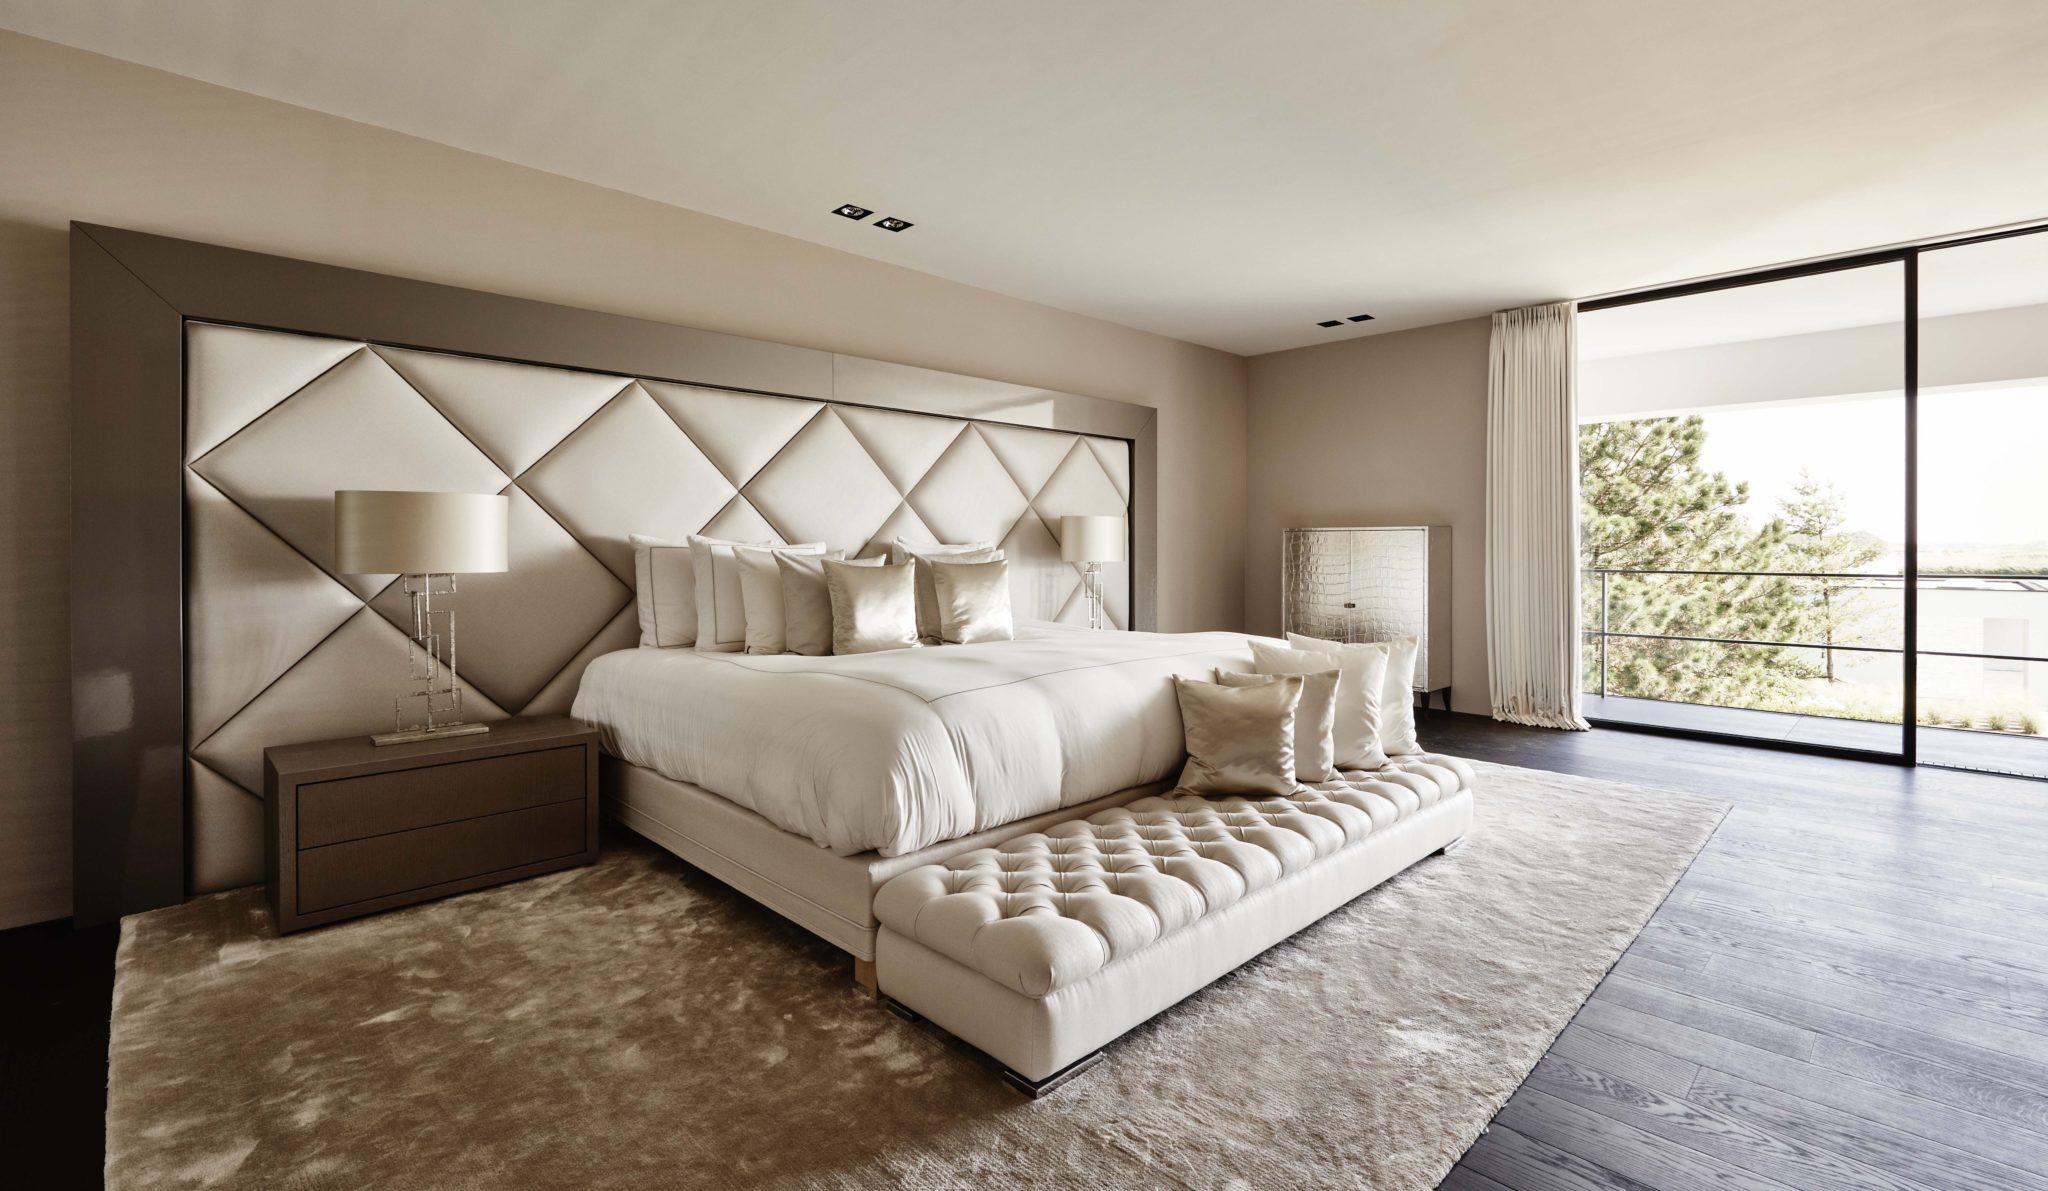 The Netherlands lakeside villa master bedroom by Eric Kuster Metropolitan Luxury